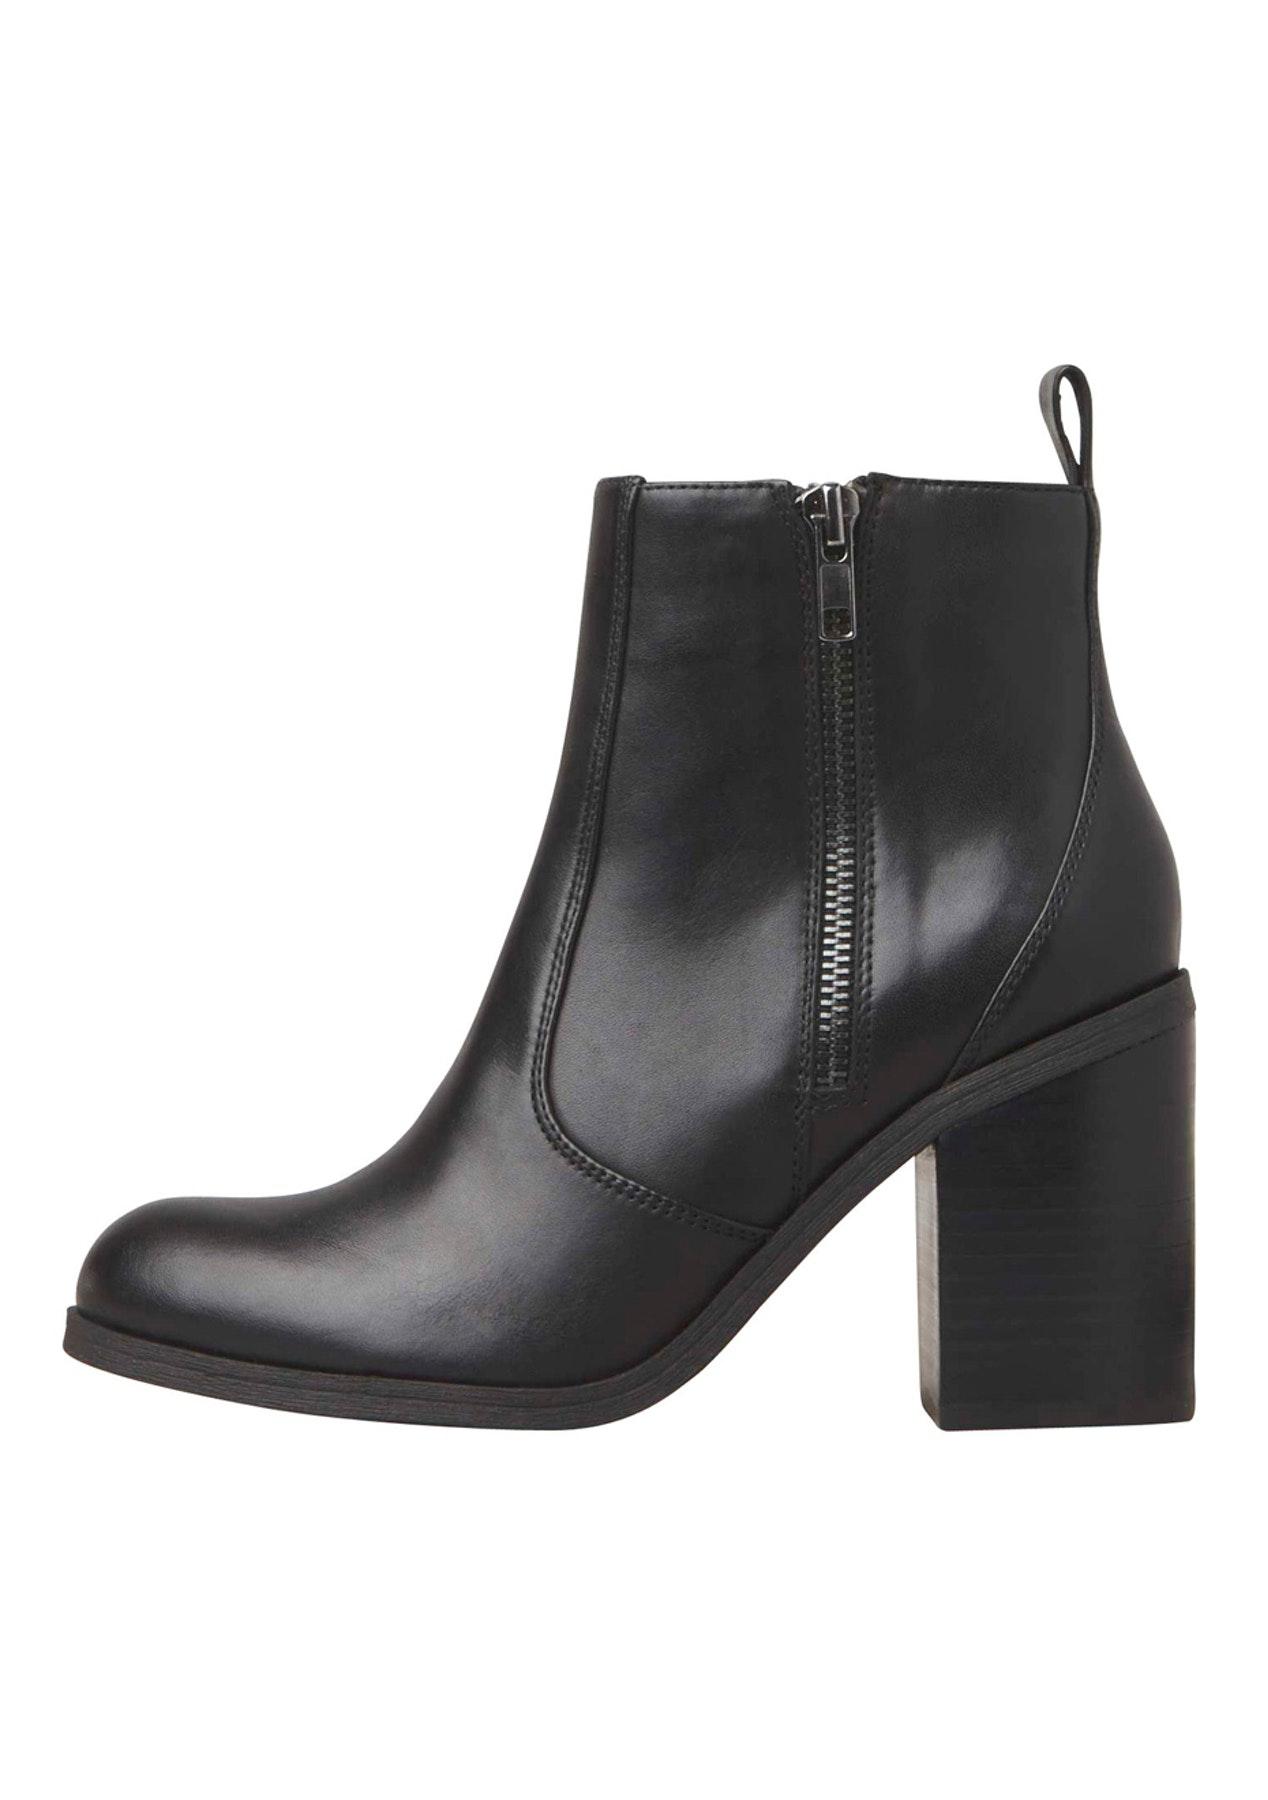 Windsor Smith - Baran - Black Leather